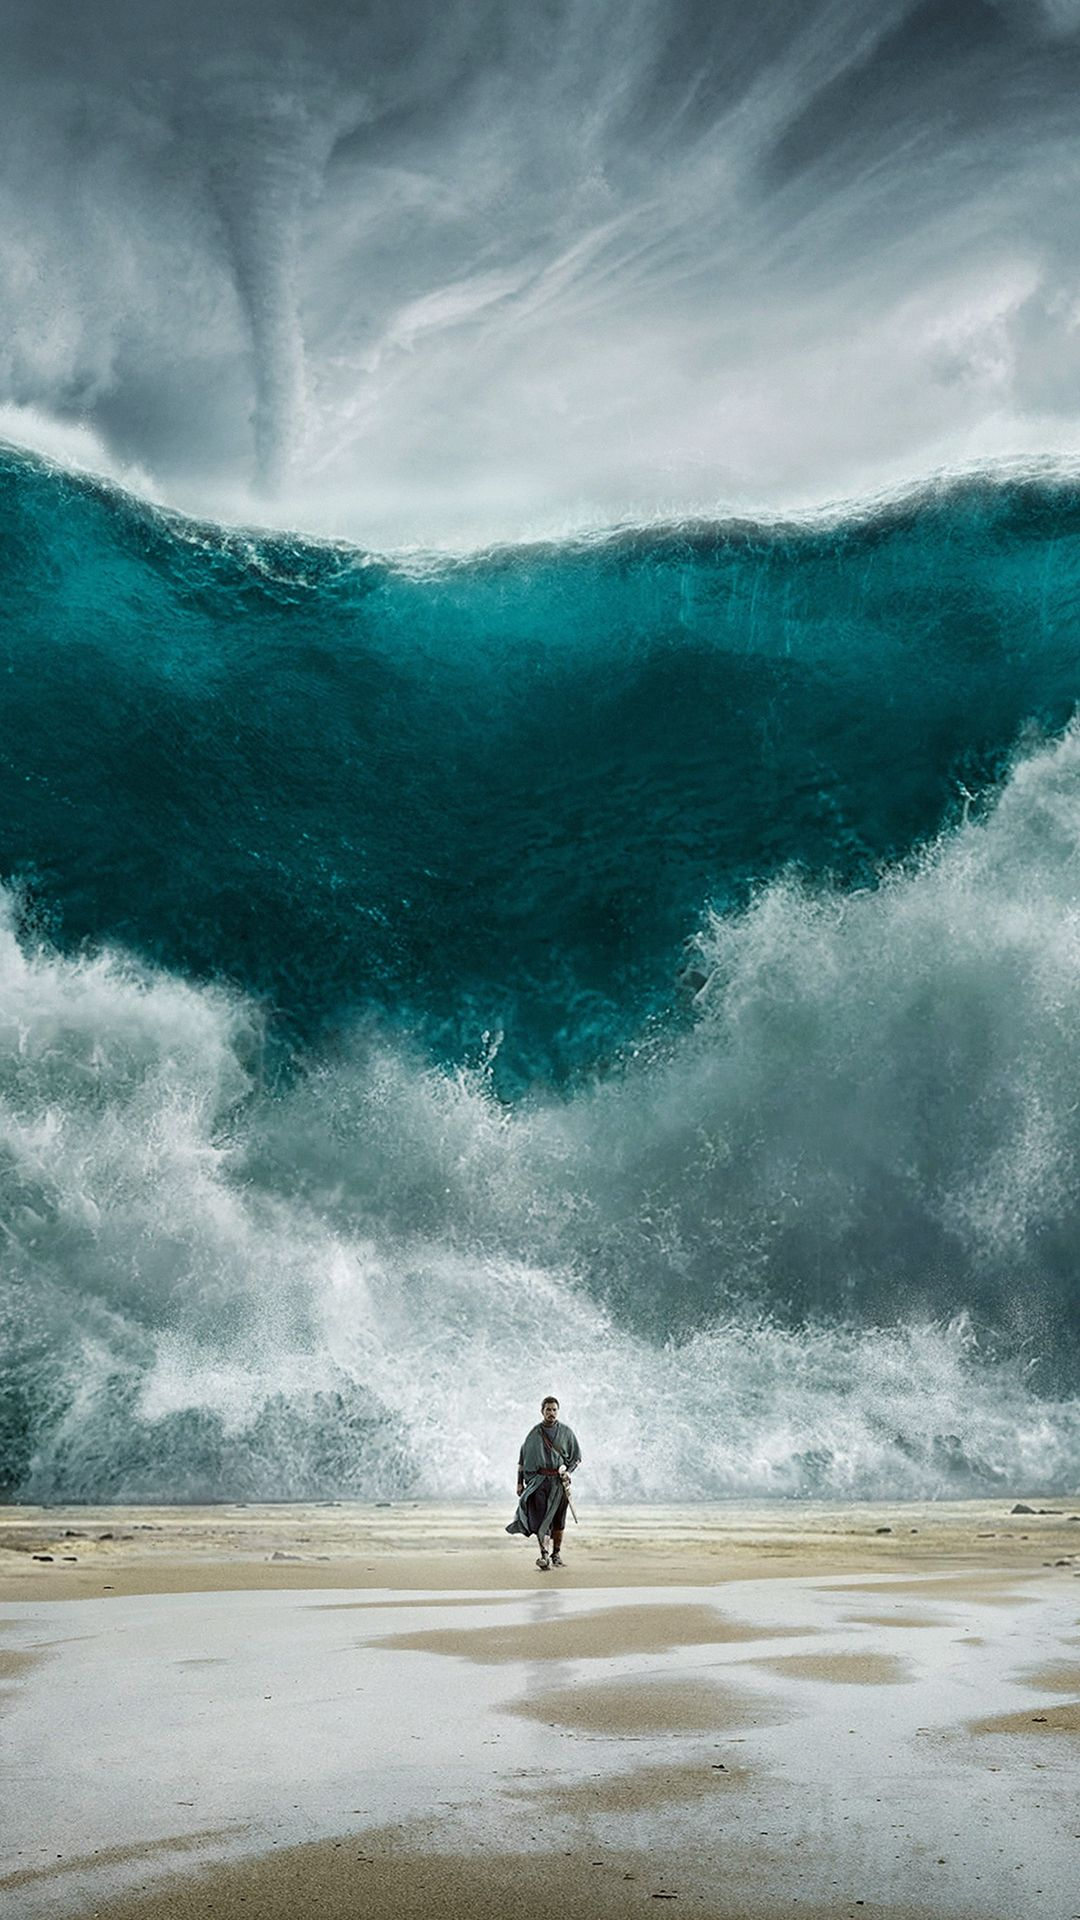 Wave Sea Art Film Illust Iphone 8 Wallpapers Iphone Wallpaper Sea Sea Art Waves Photography